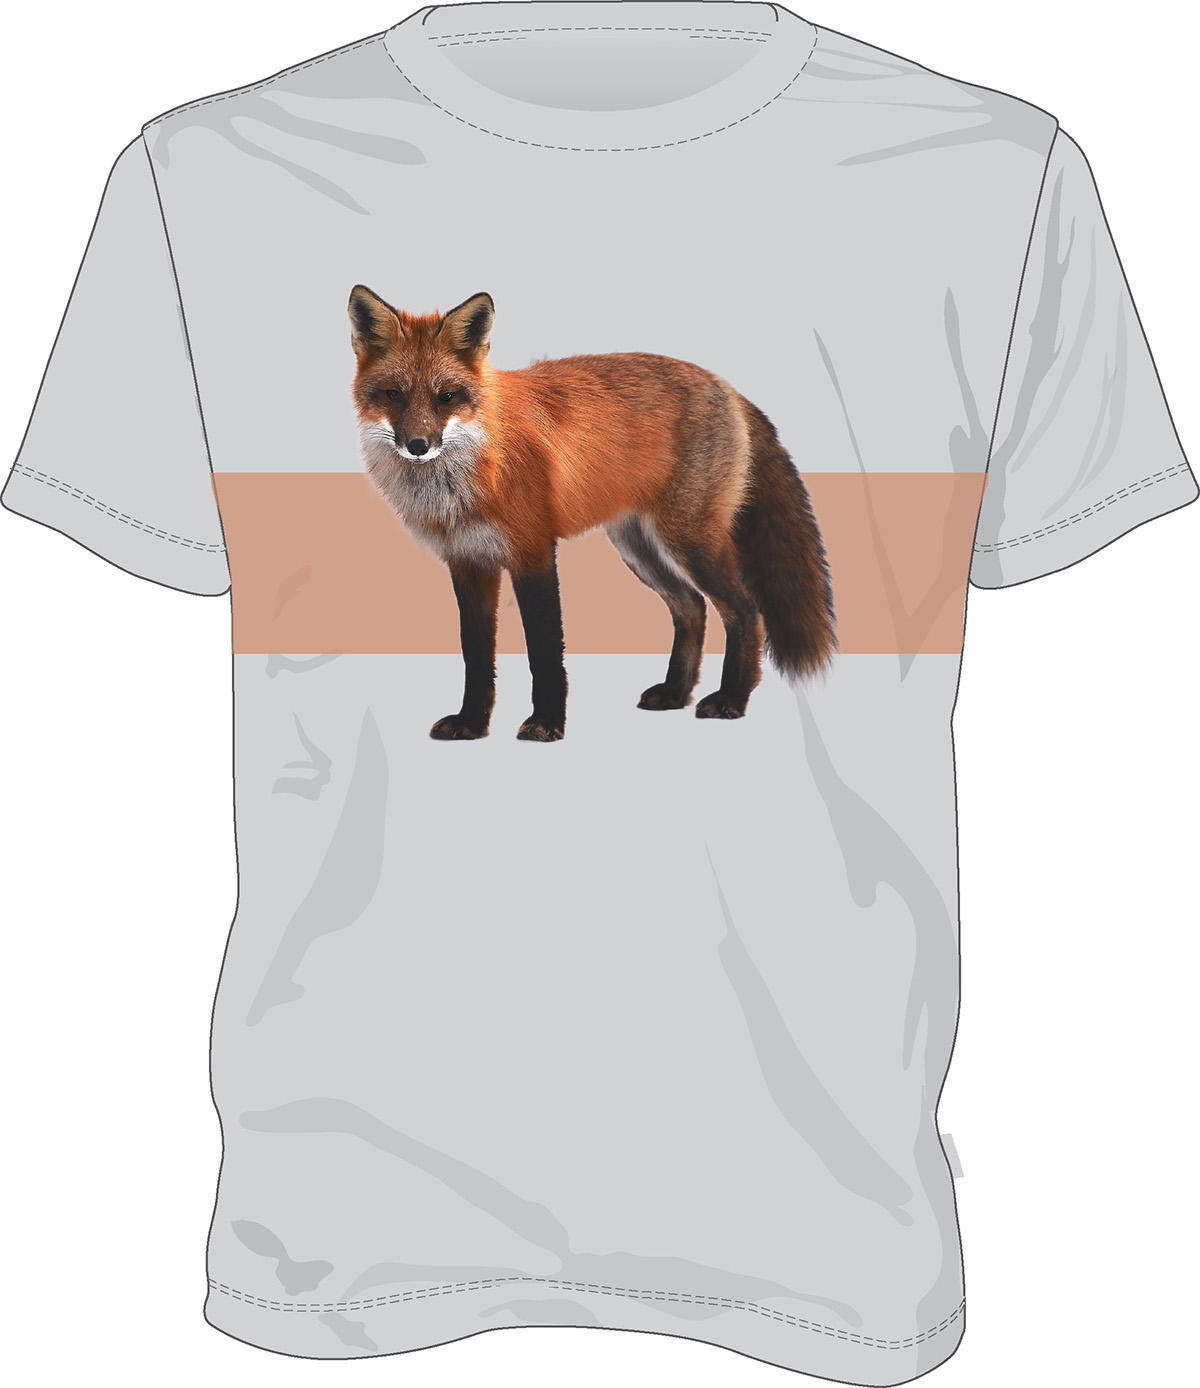 Minnesota Zoo T Shirt Design On Behance